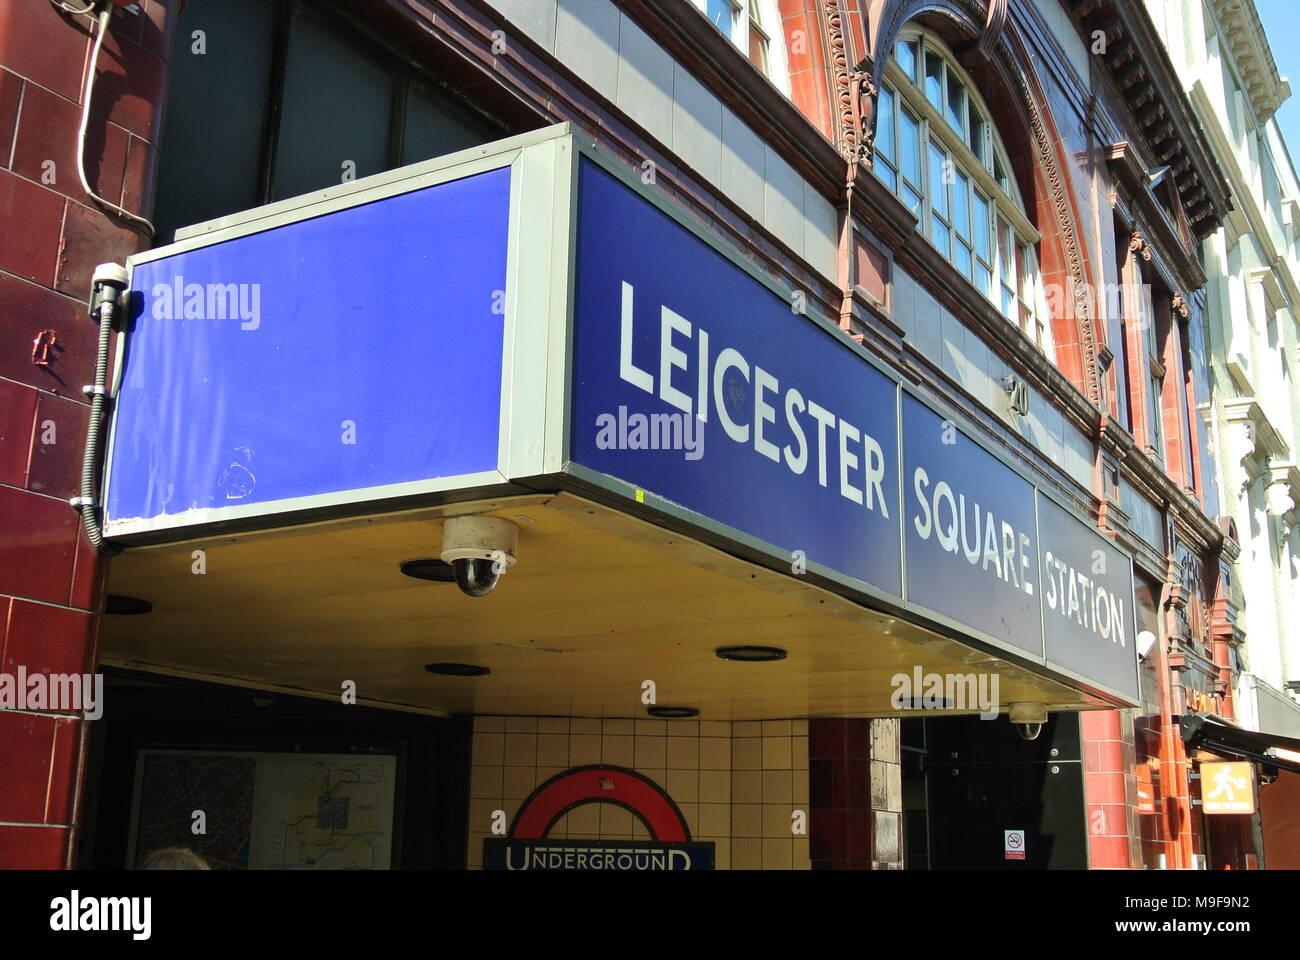 Leicester Square Station sign, Cranbourn Street, London, England, UK - Stock Image